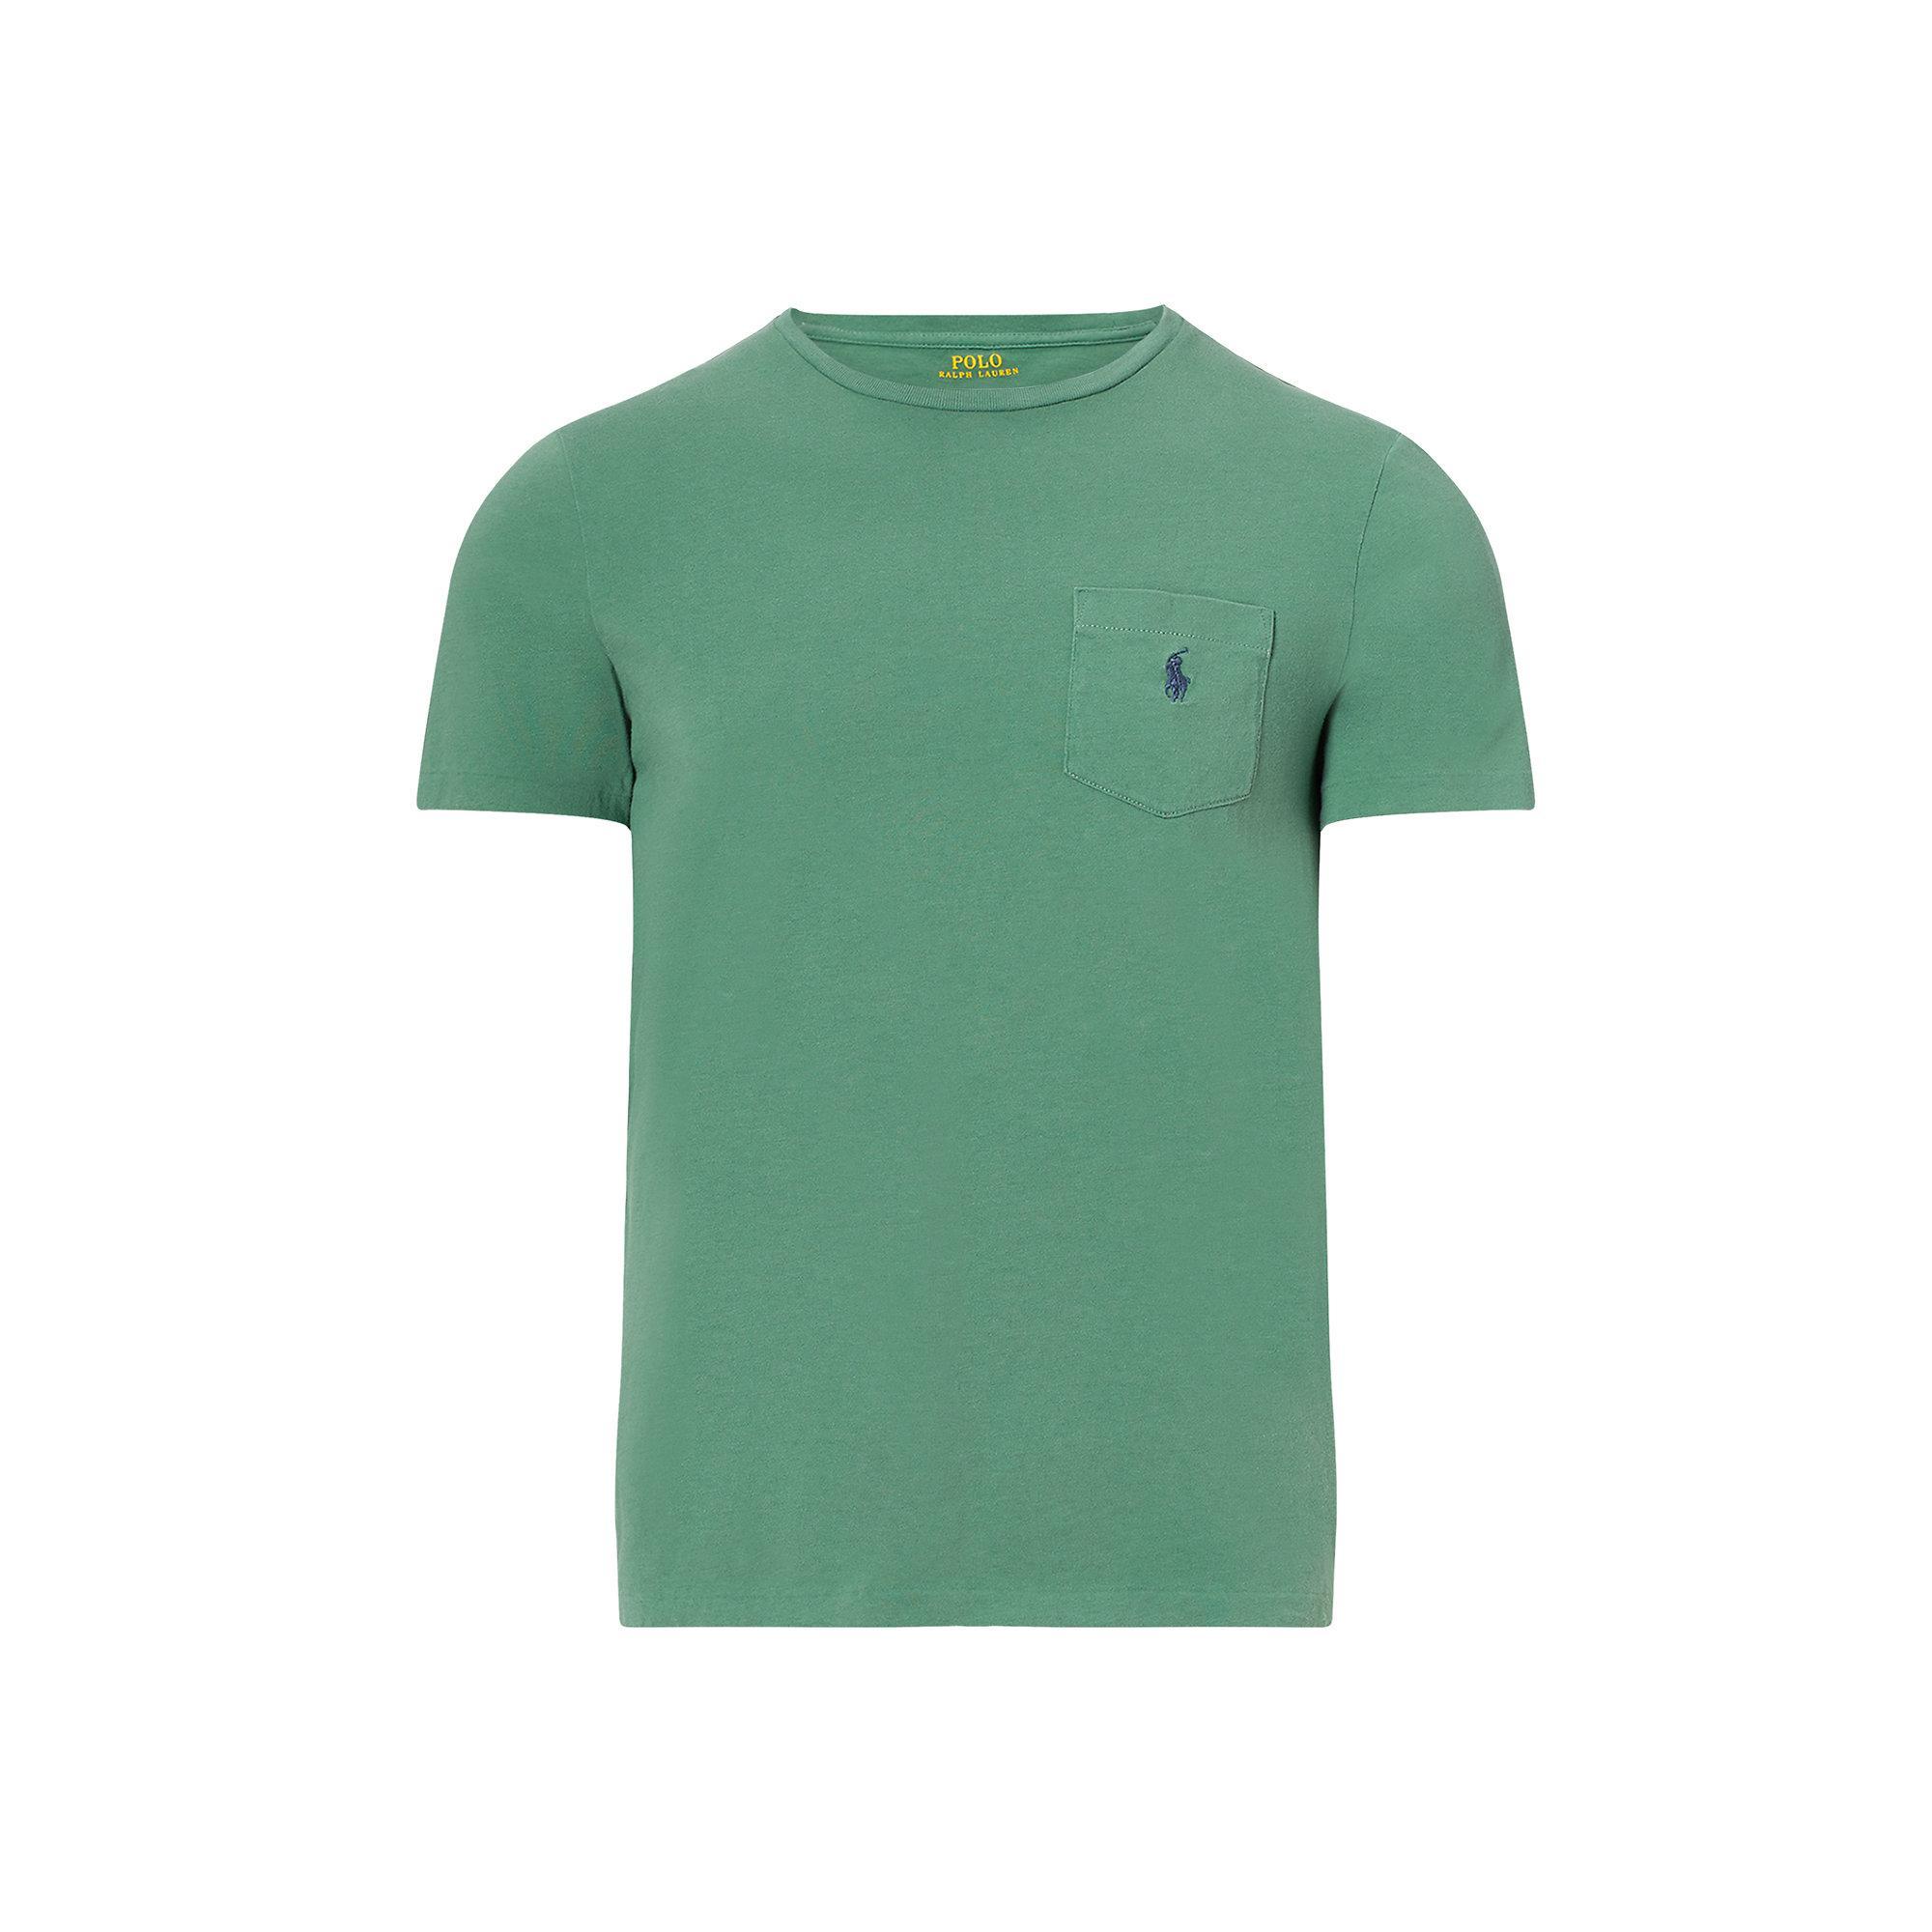 Polo ralph lauren custom fit cotton t shirt in green for for Polo custom fit t shirts